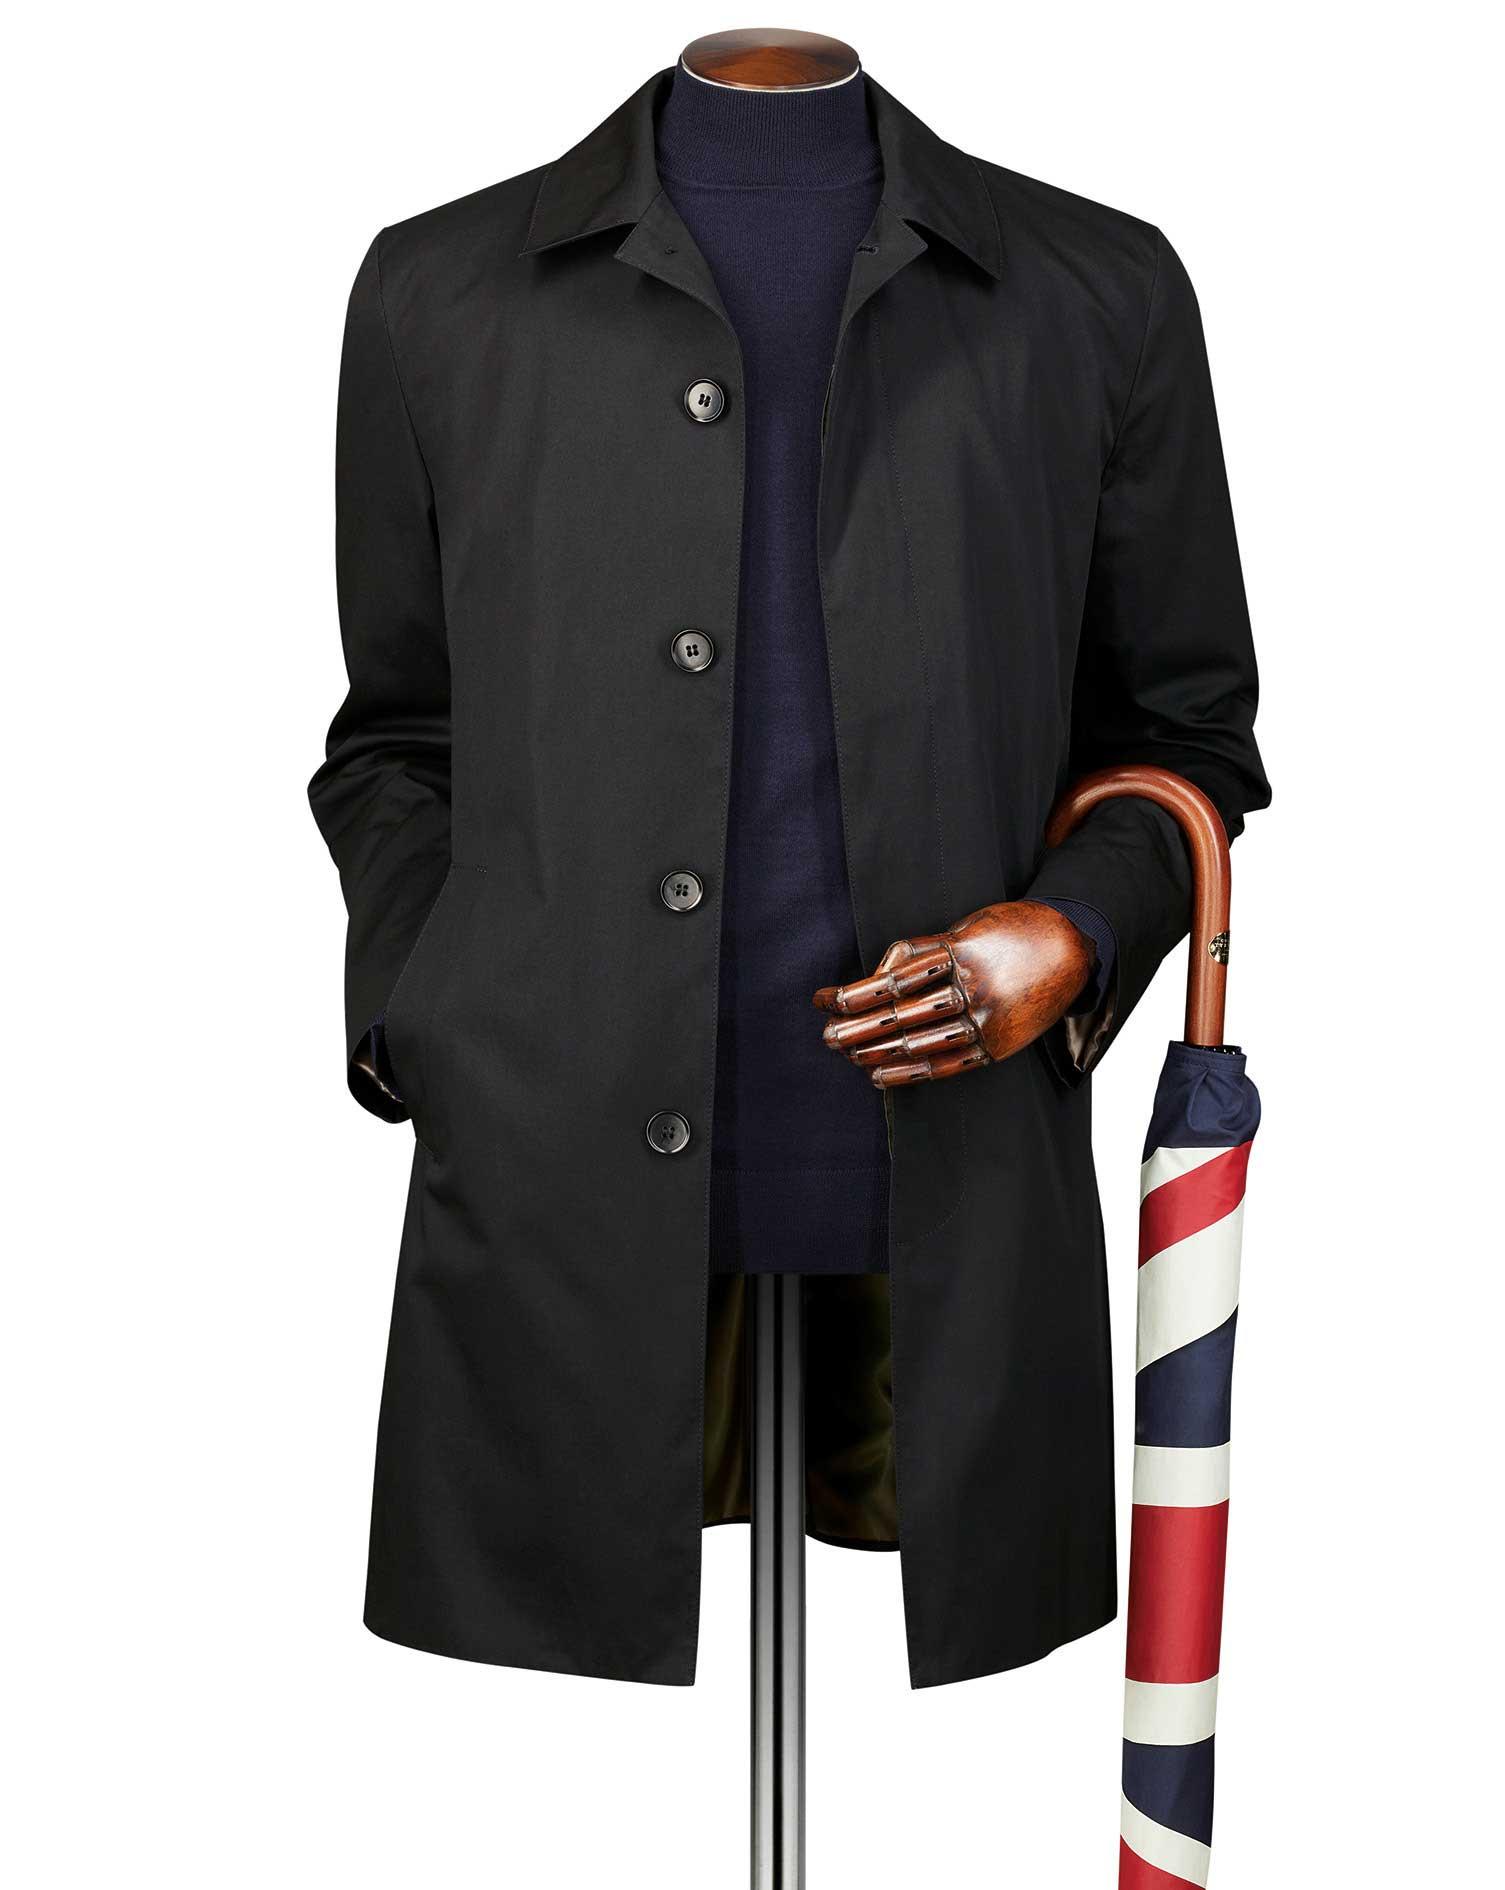 Black Cotton Raincoat Size 42 Regular by Charles Tyrwhitt